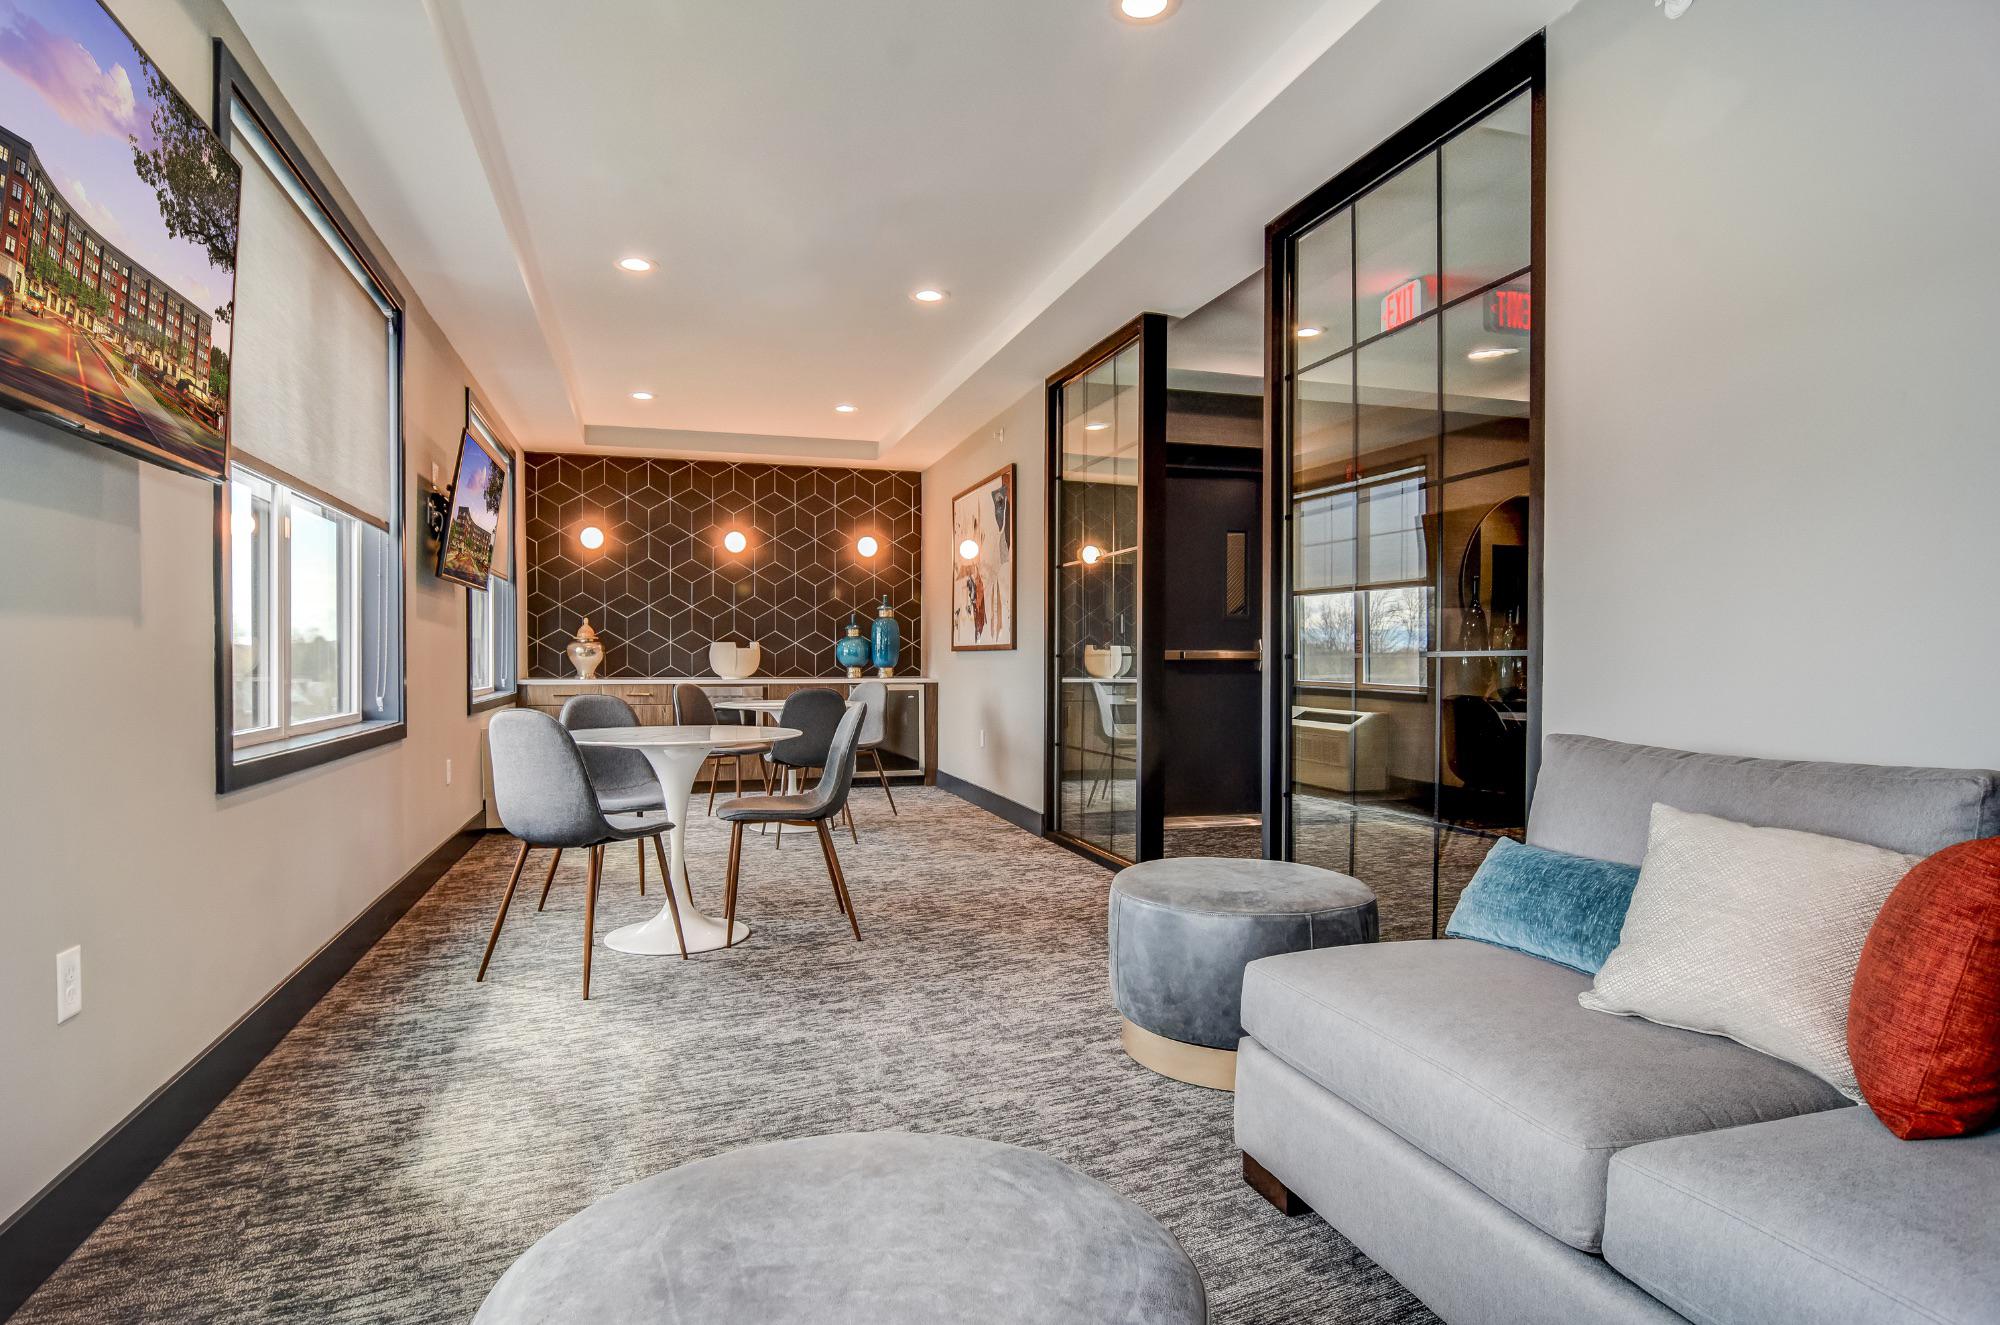 Multifamily lounge area